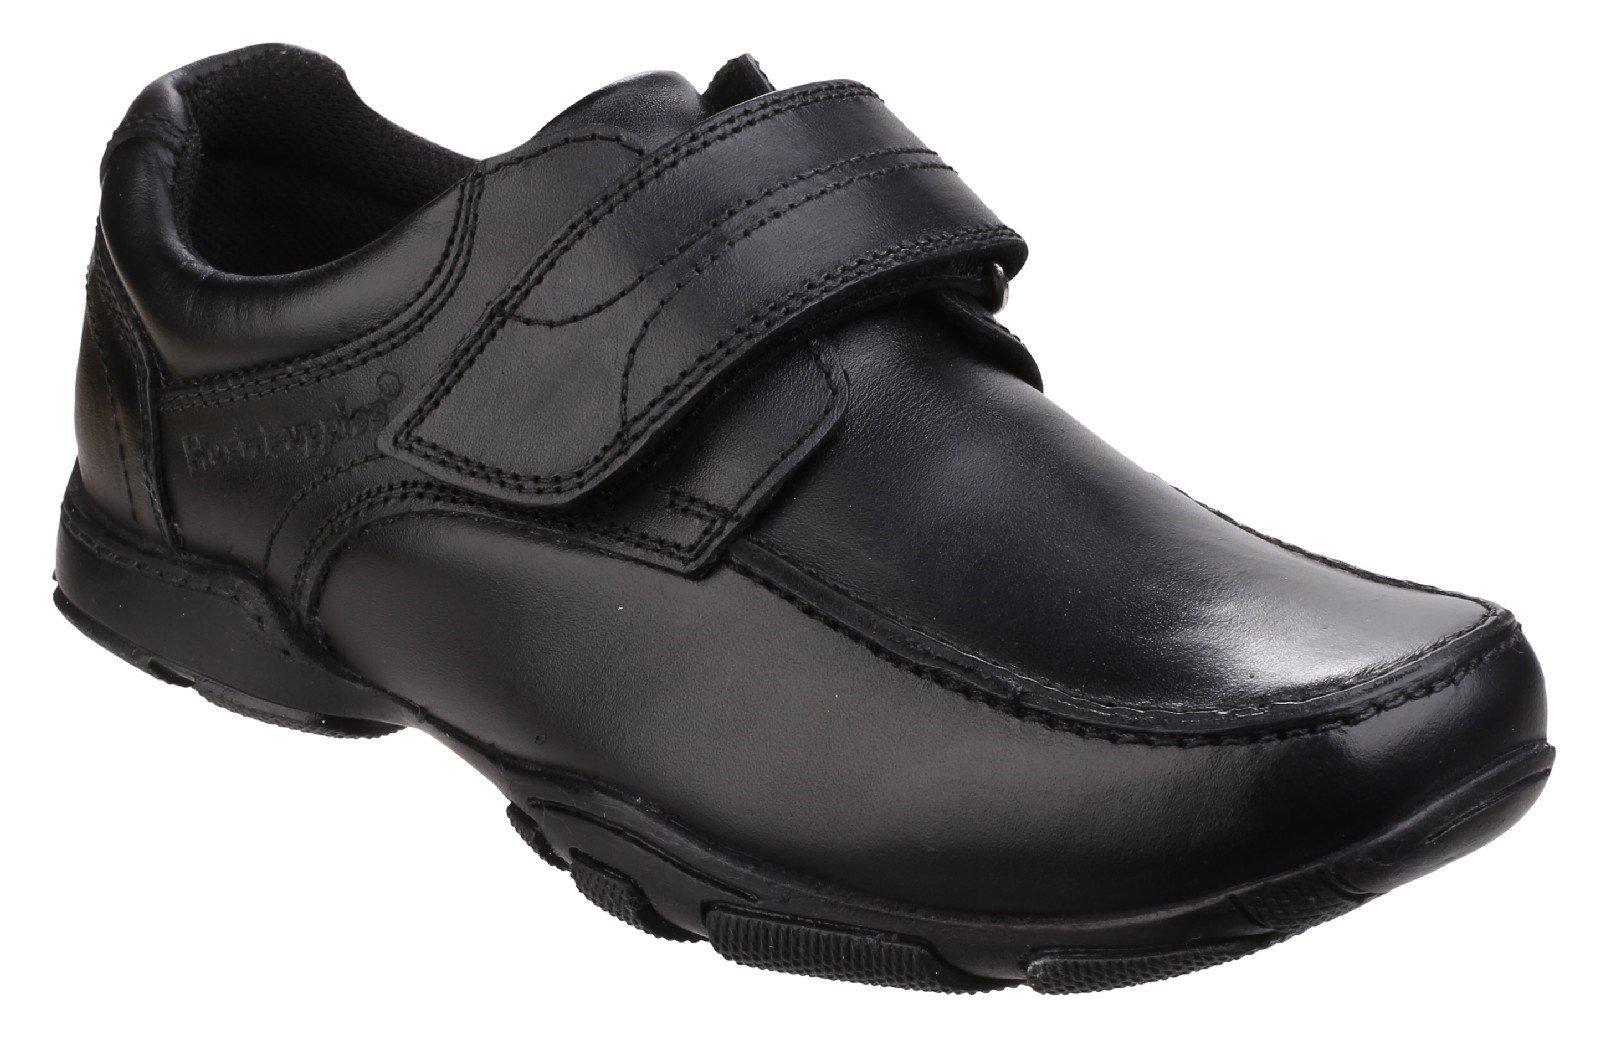 Hush Puppies Men's Freddy 2 Touch Fastening School Shoe Black 25345 - Black 10 UK